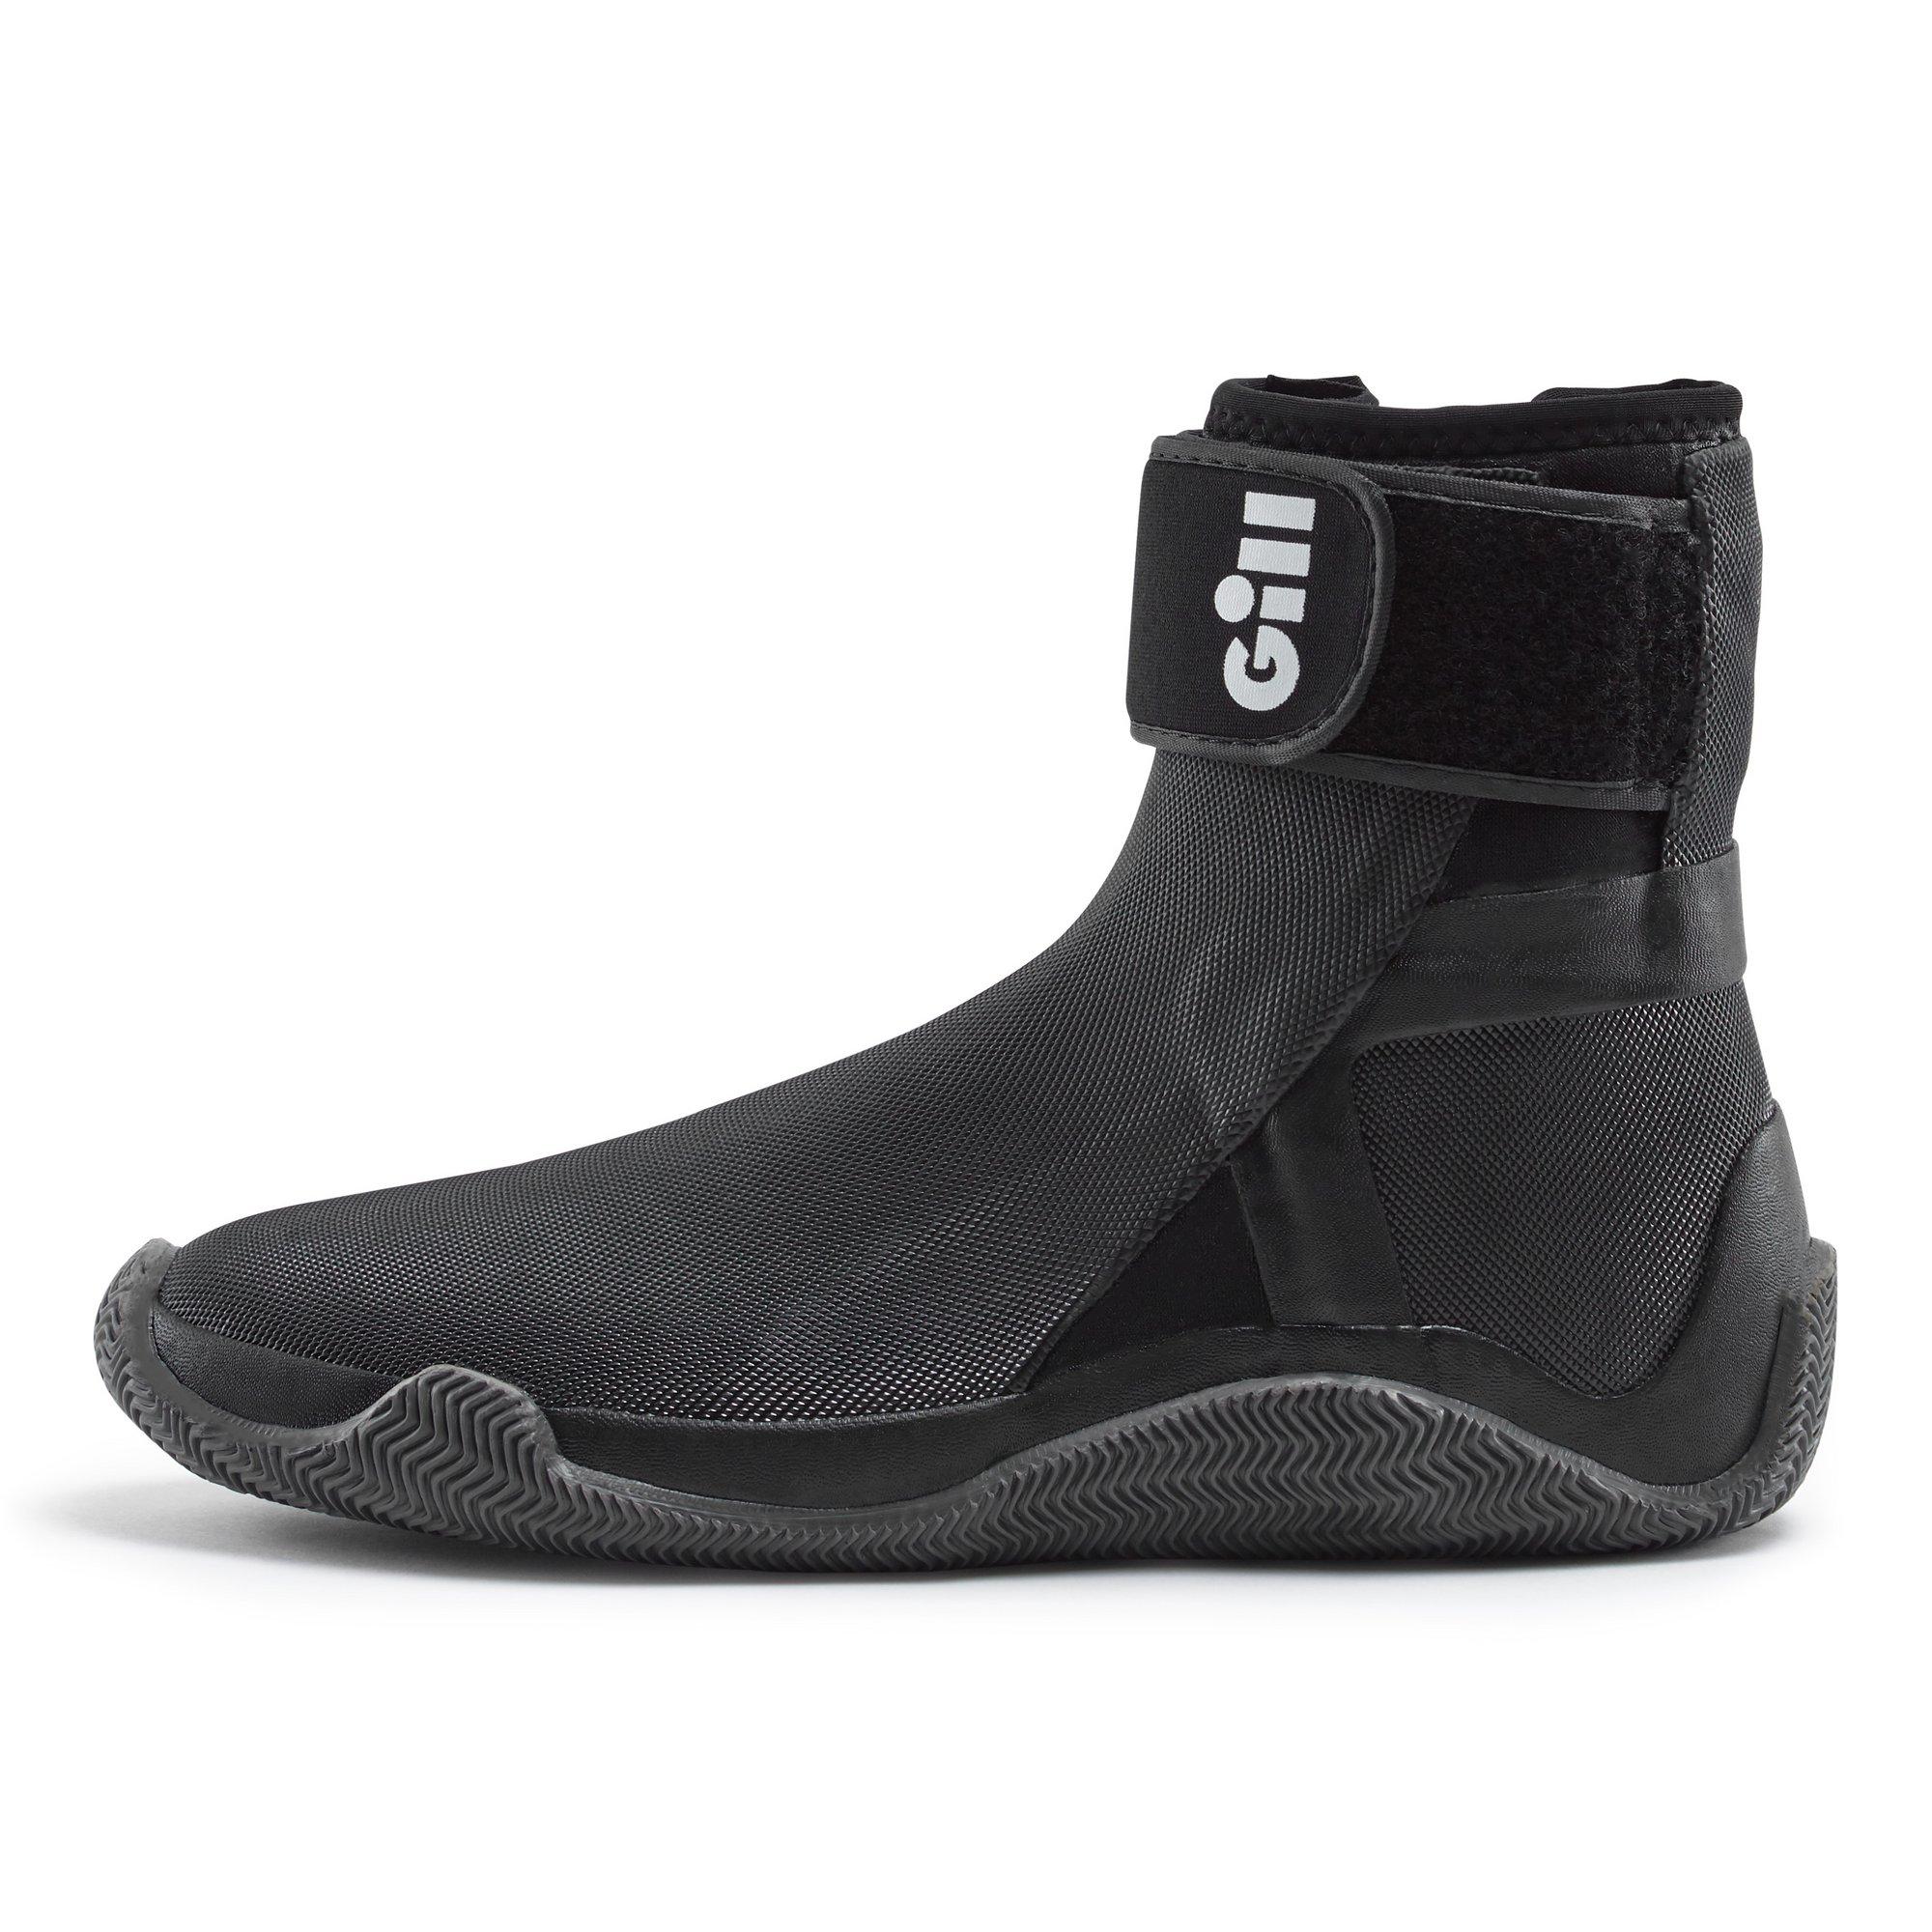 Edge Boots - 961-BLK20-1.jpg